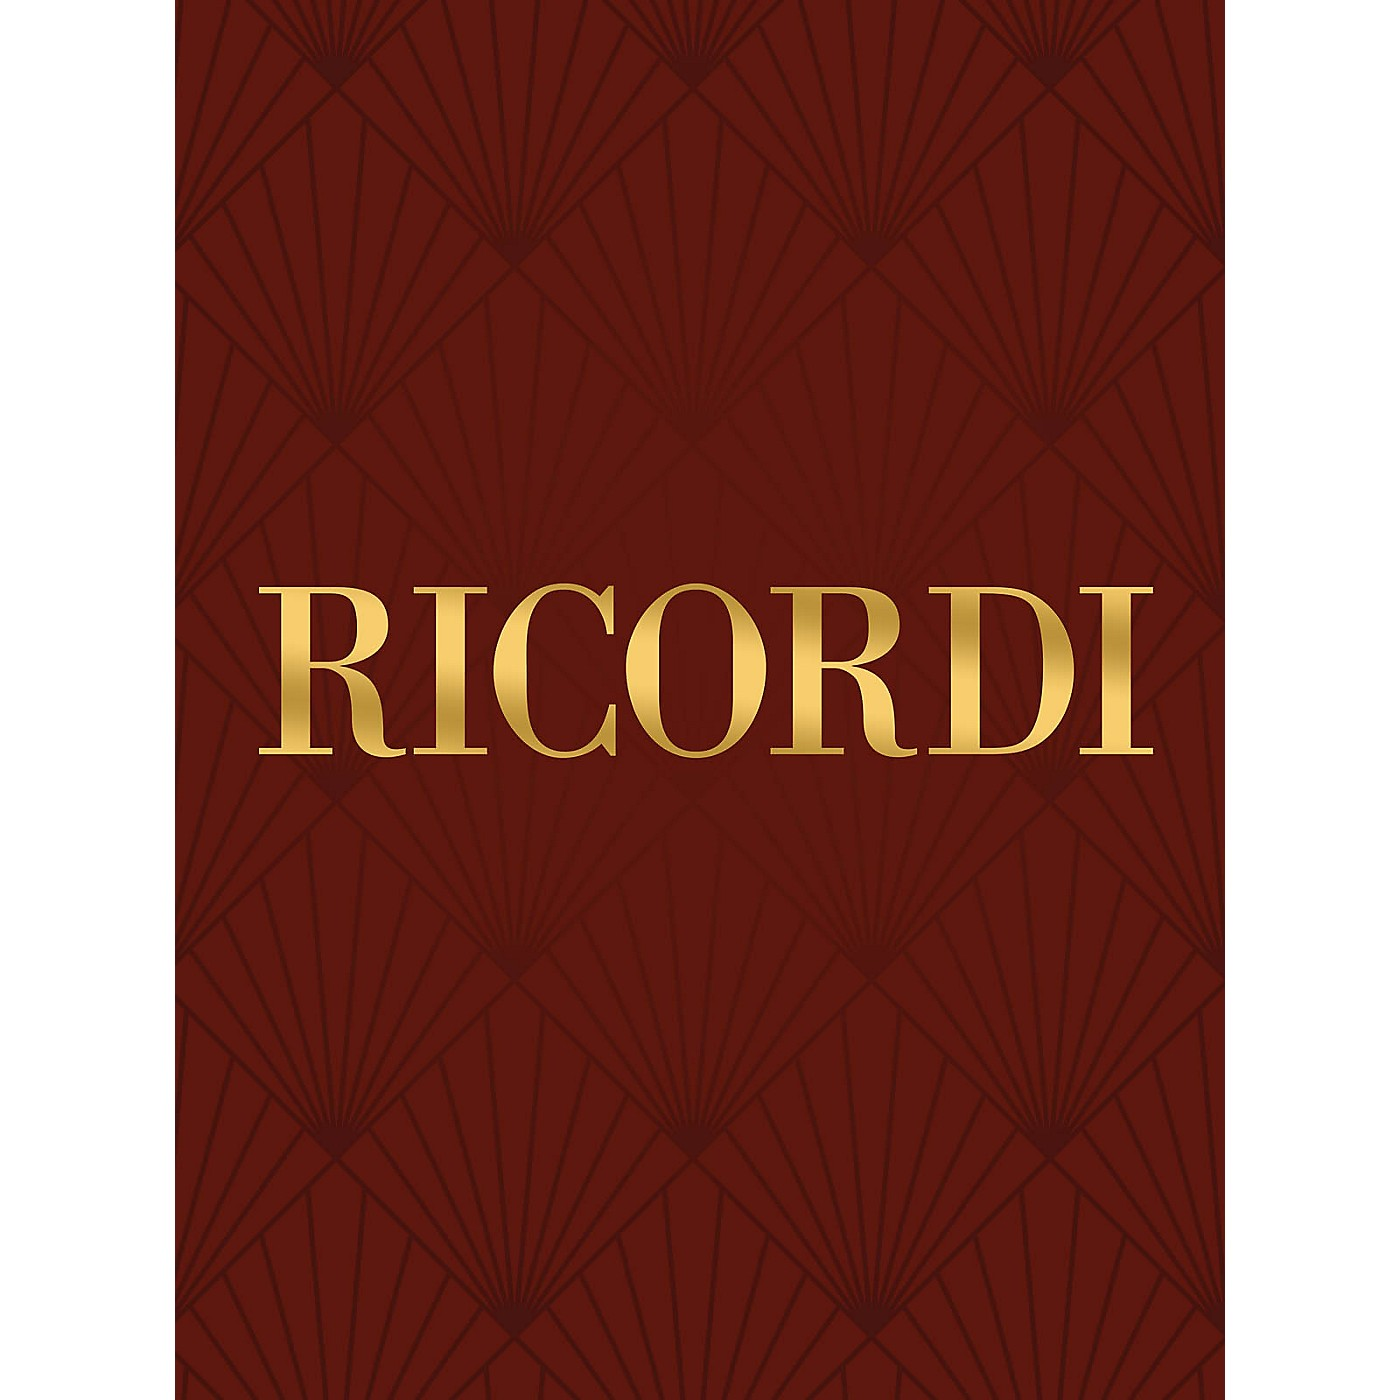 Ricordi 6 Studi Da Concerto (Piano Solo) Piano Large Works Series Composed by Franz Liszt thumbnail